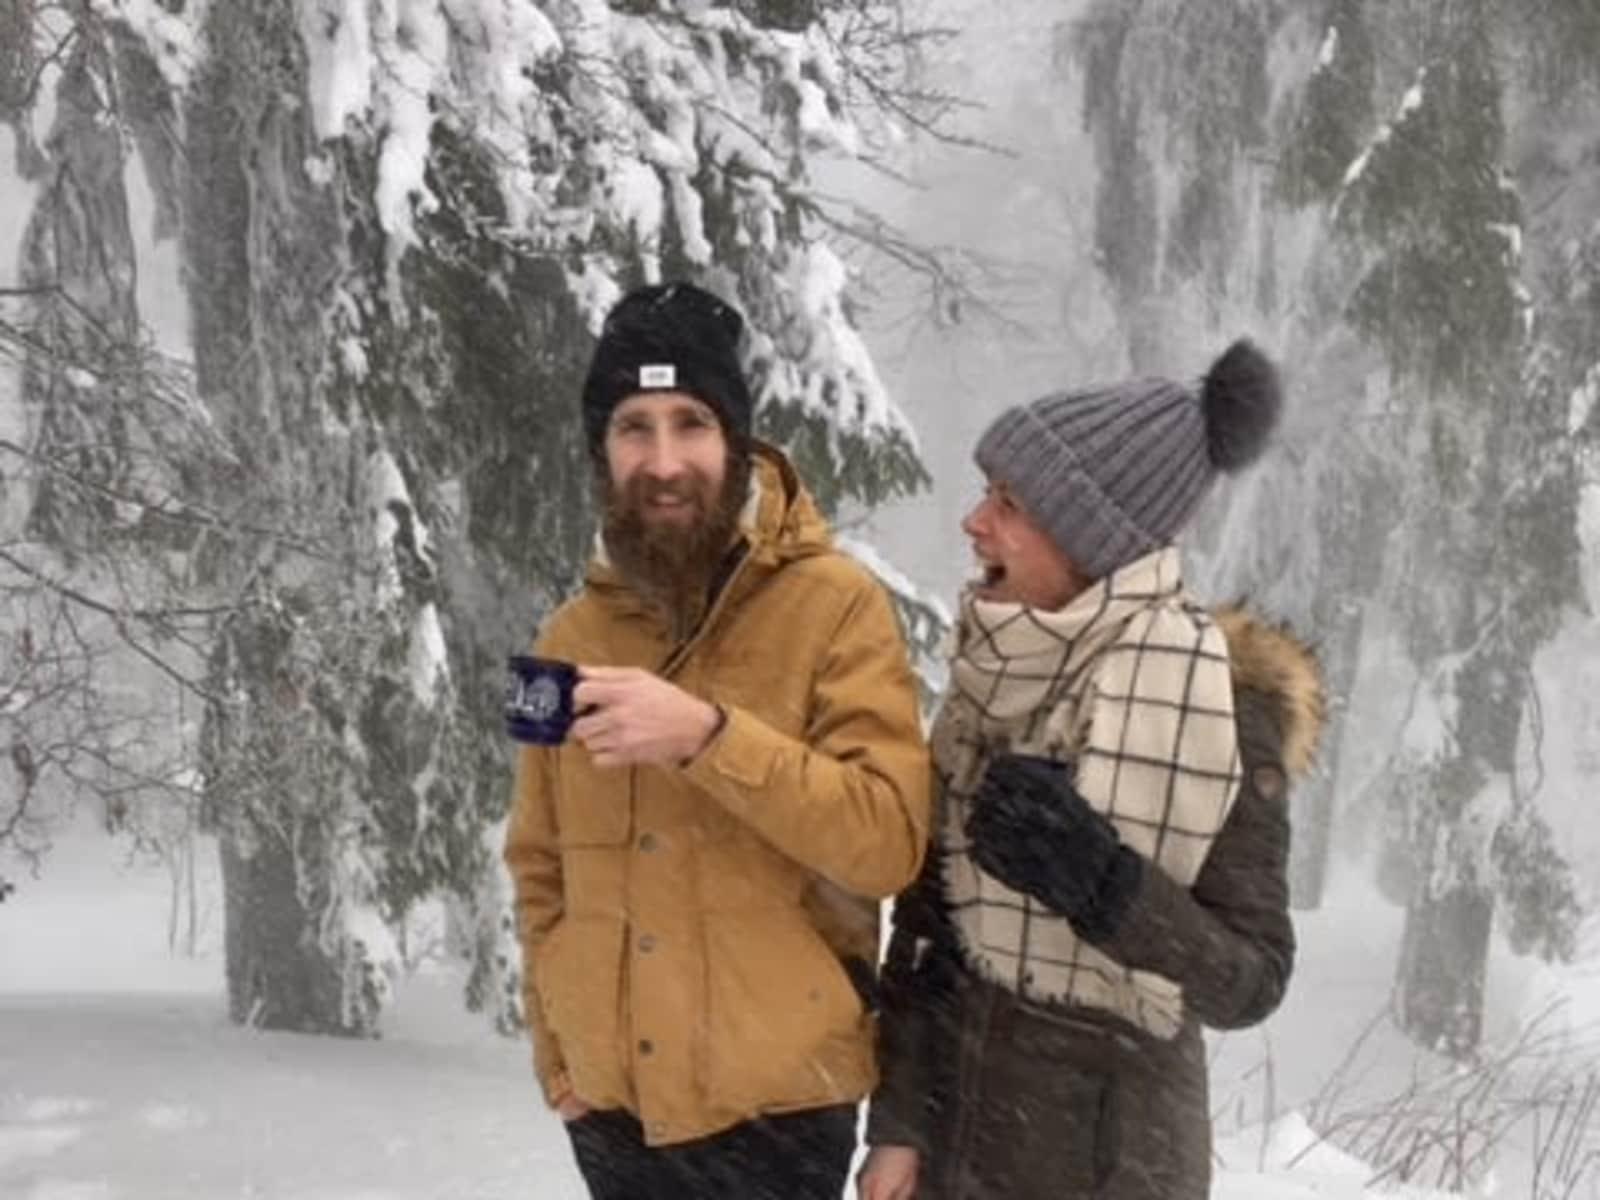 Joel & Ashleigh from Passau, Germany